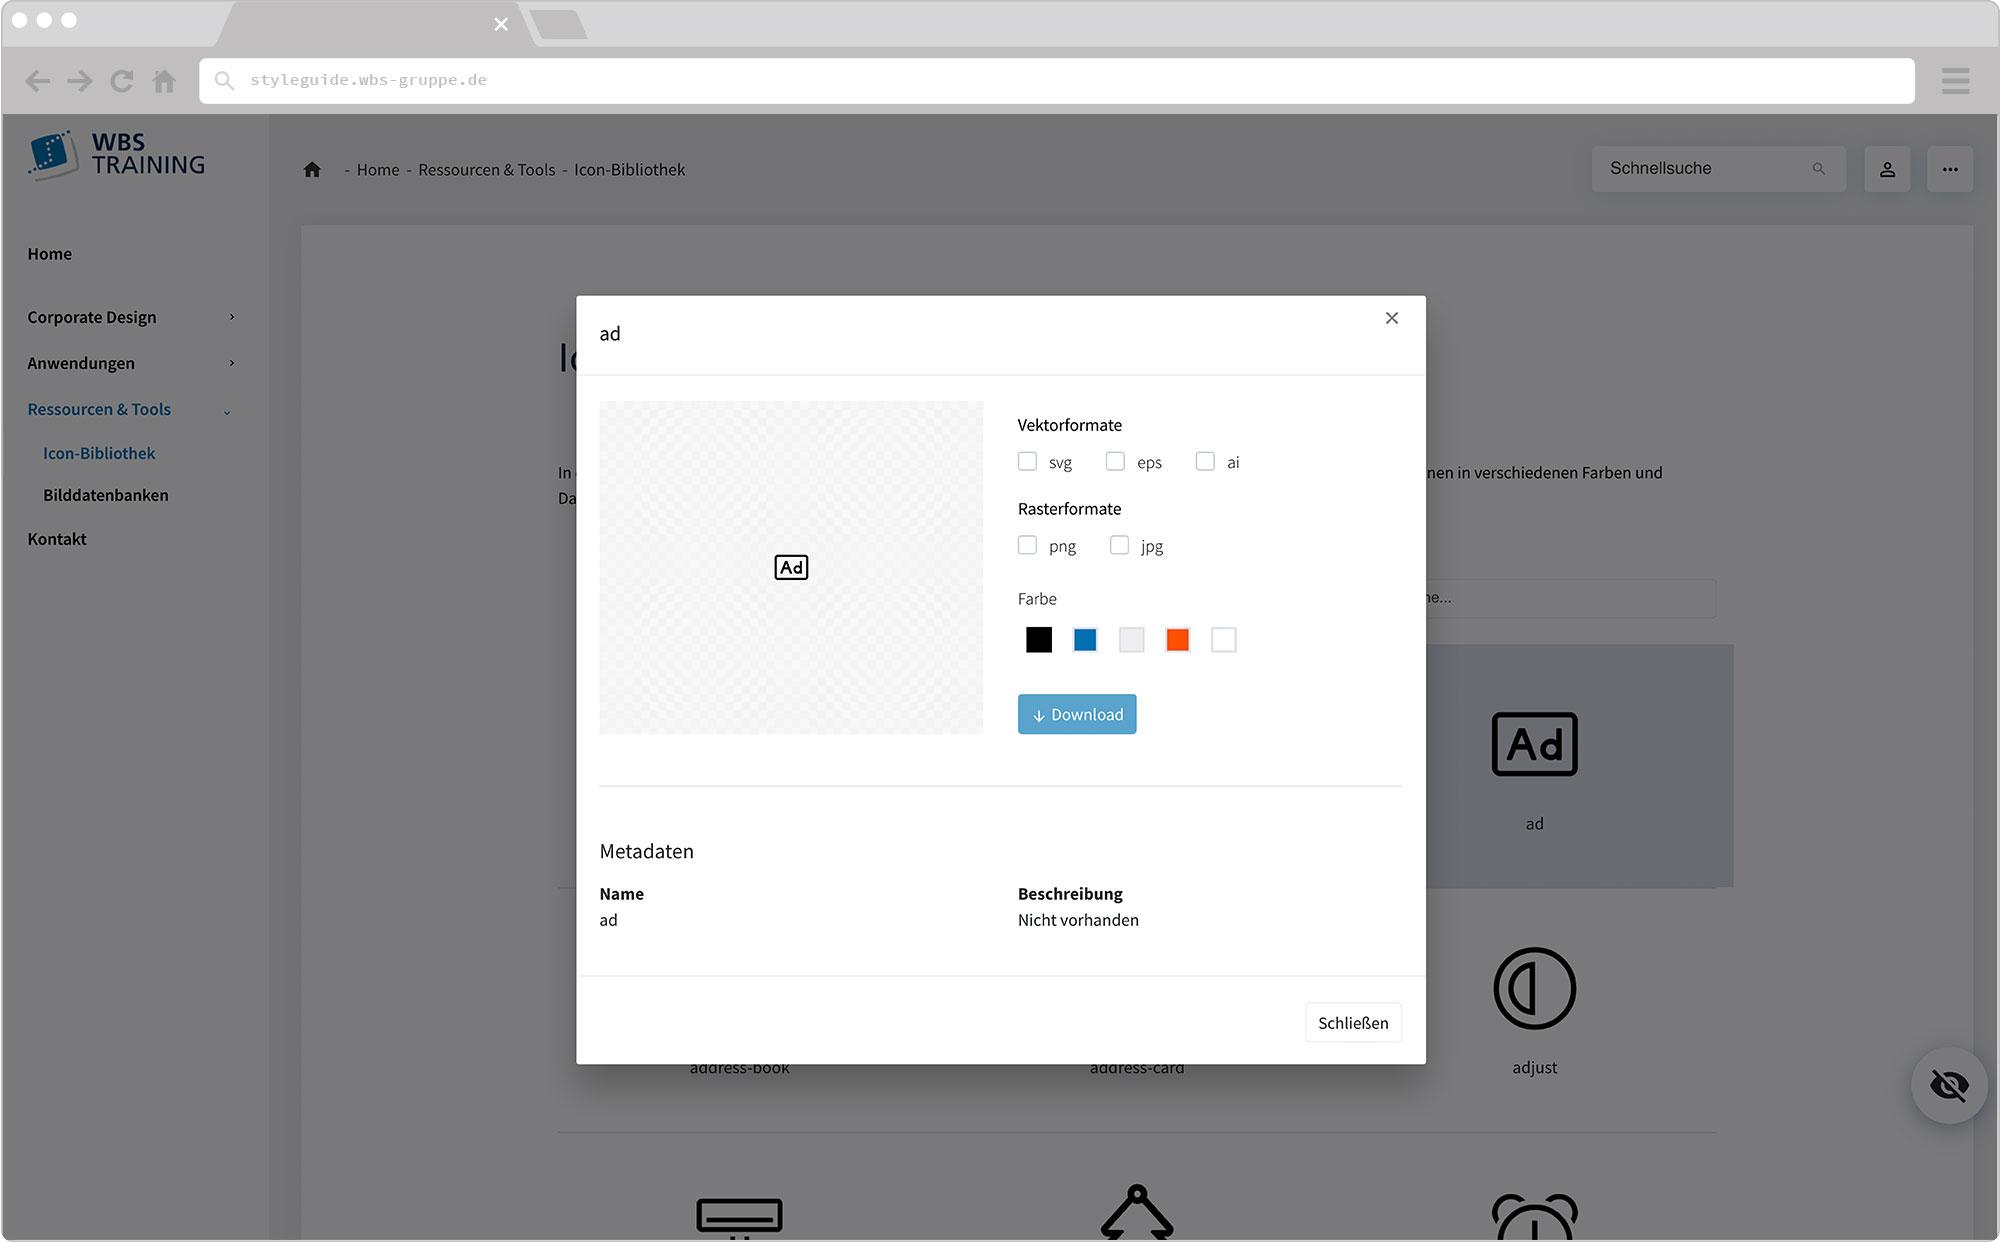 WBS Update 2021 / Slider, Screen wirHub Brand Manangement – Icon Bibliothek Export